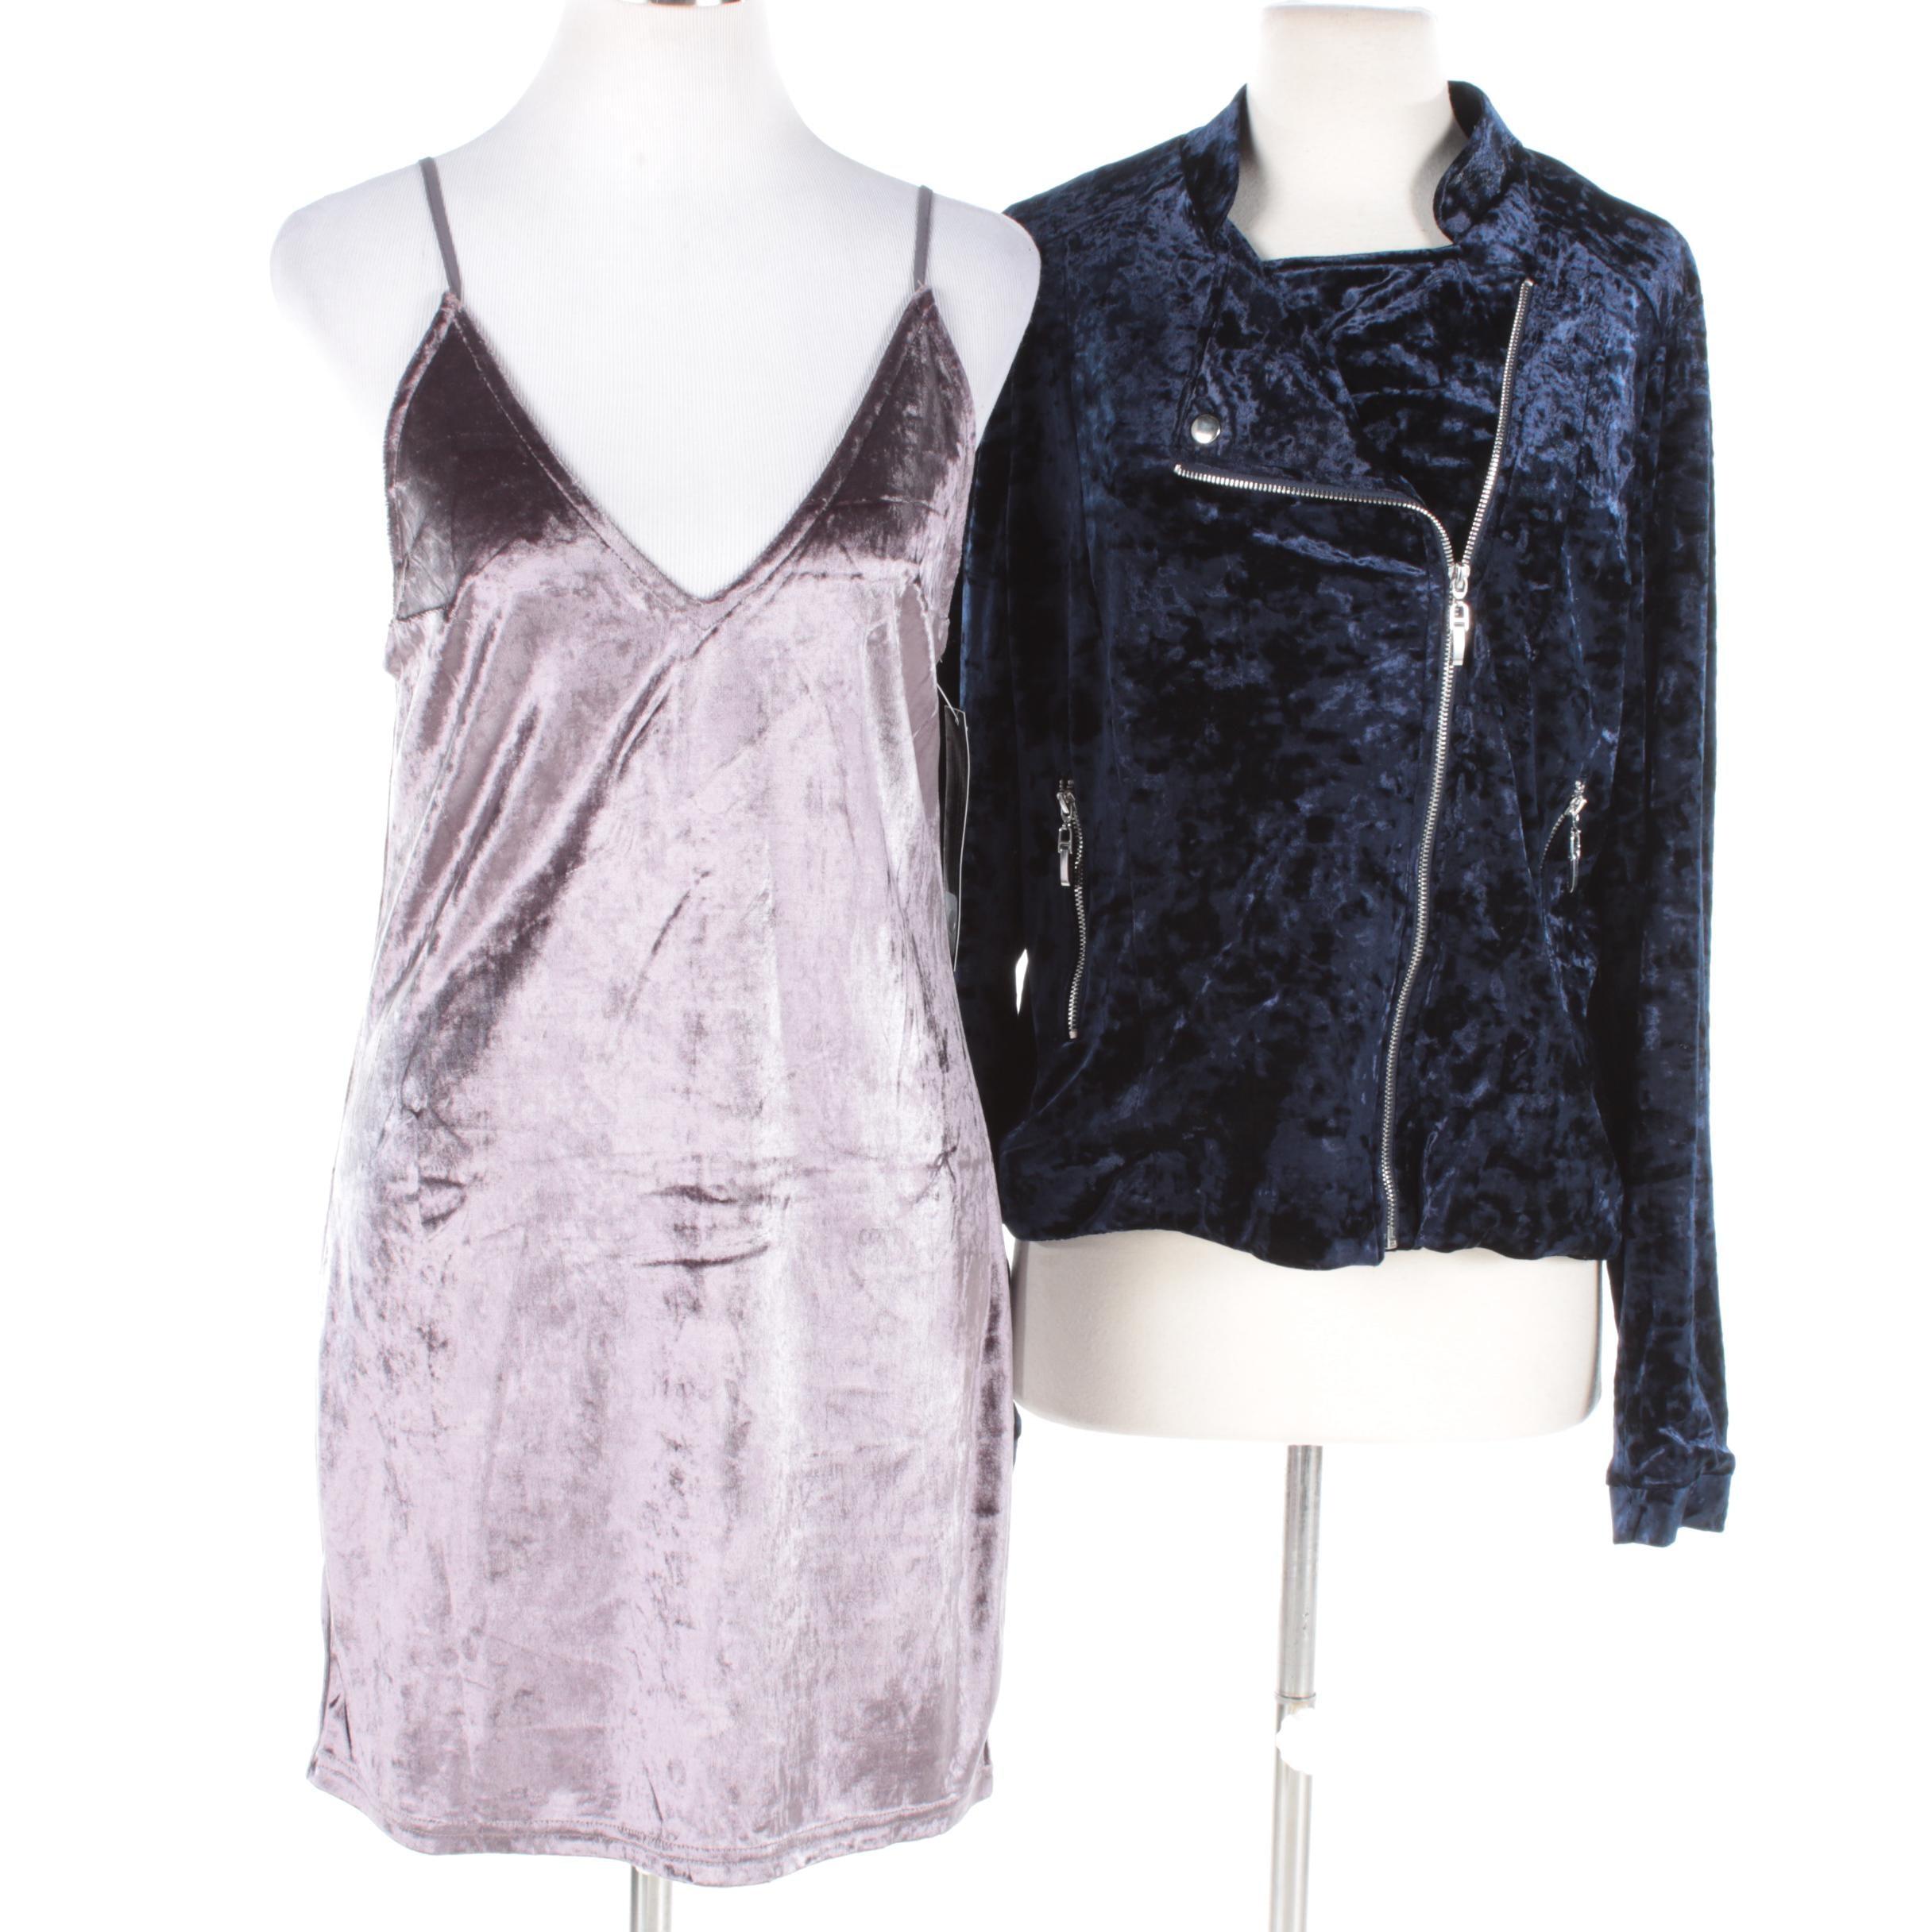 Women's Velveteen Jacket and Slip Dress Including Goldie